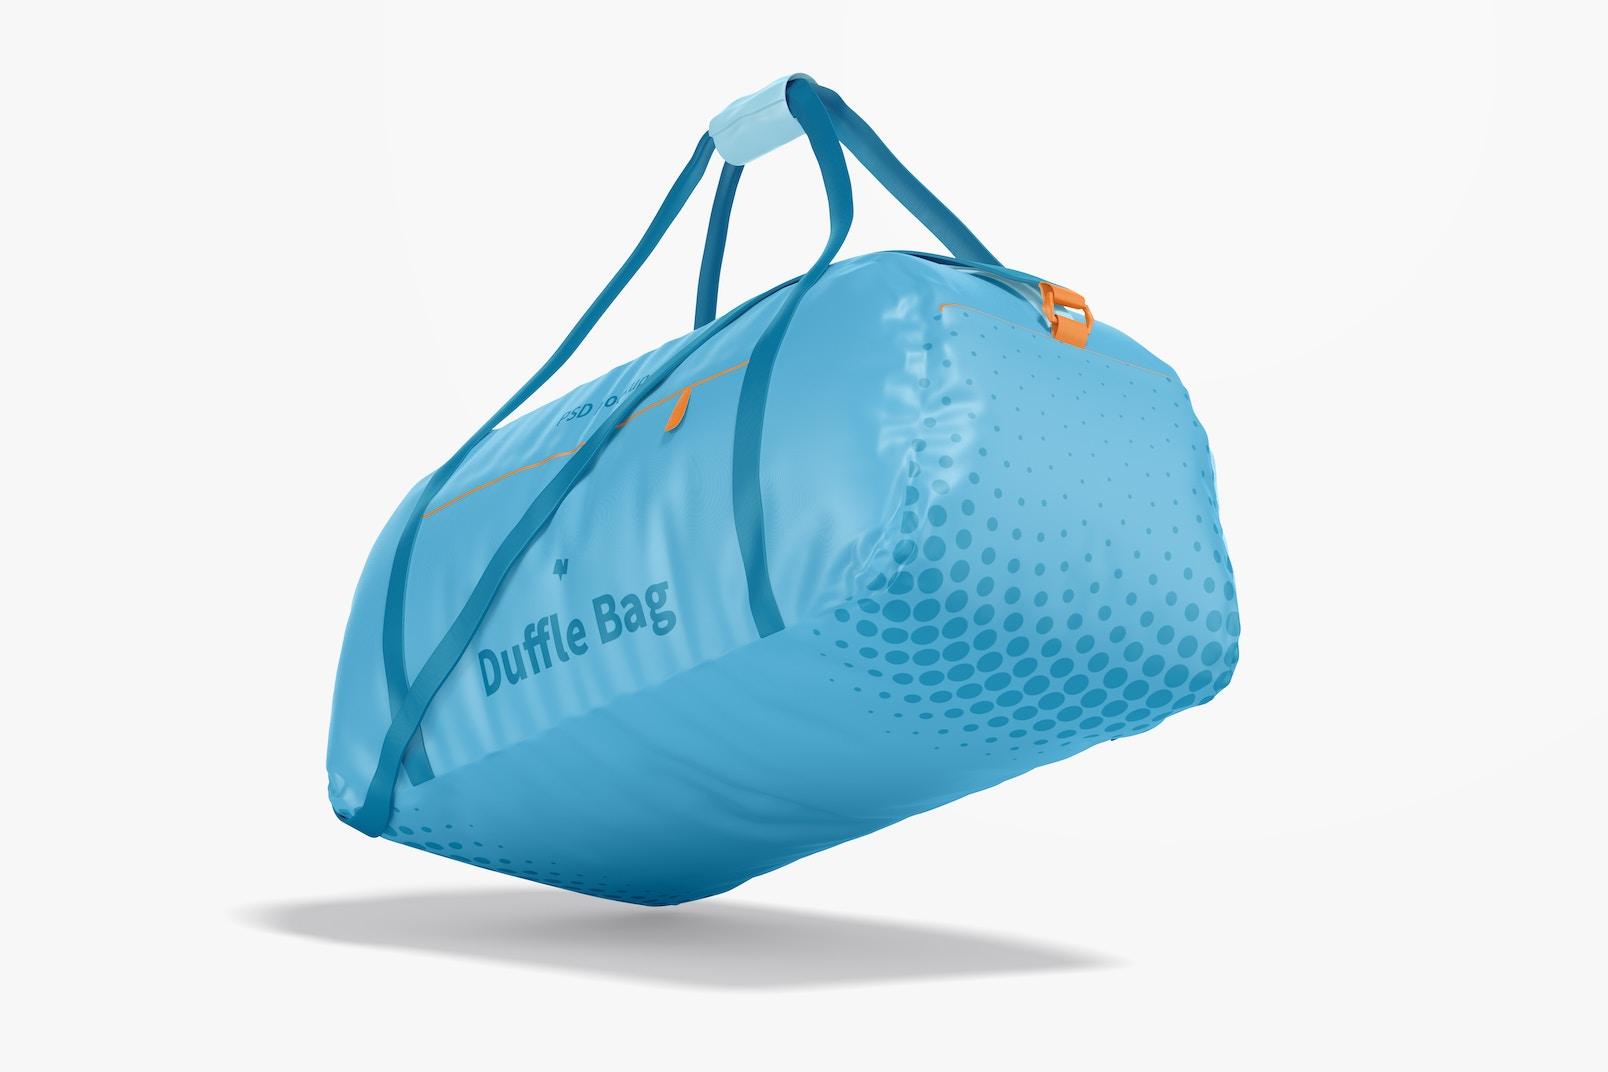 Duffle Bag Mockup